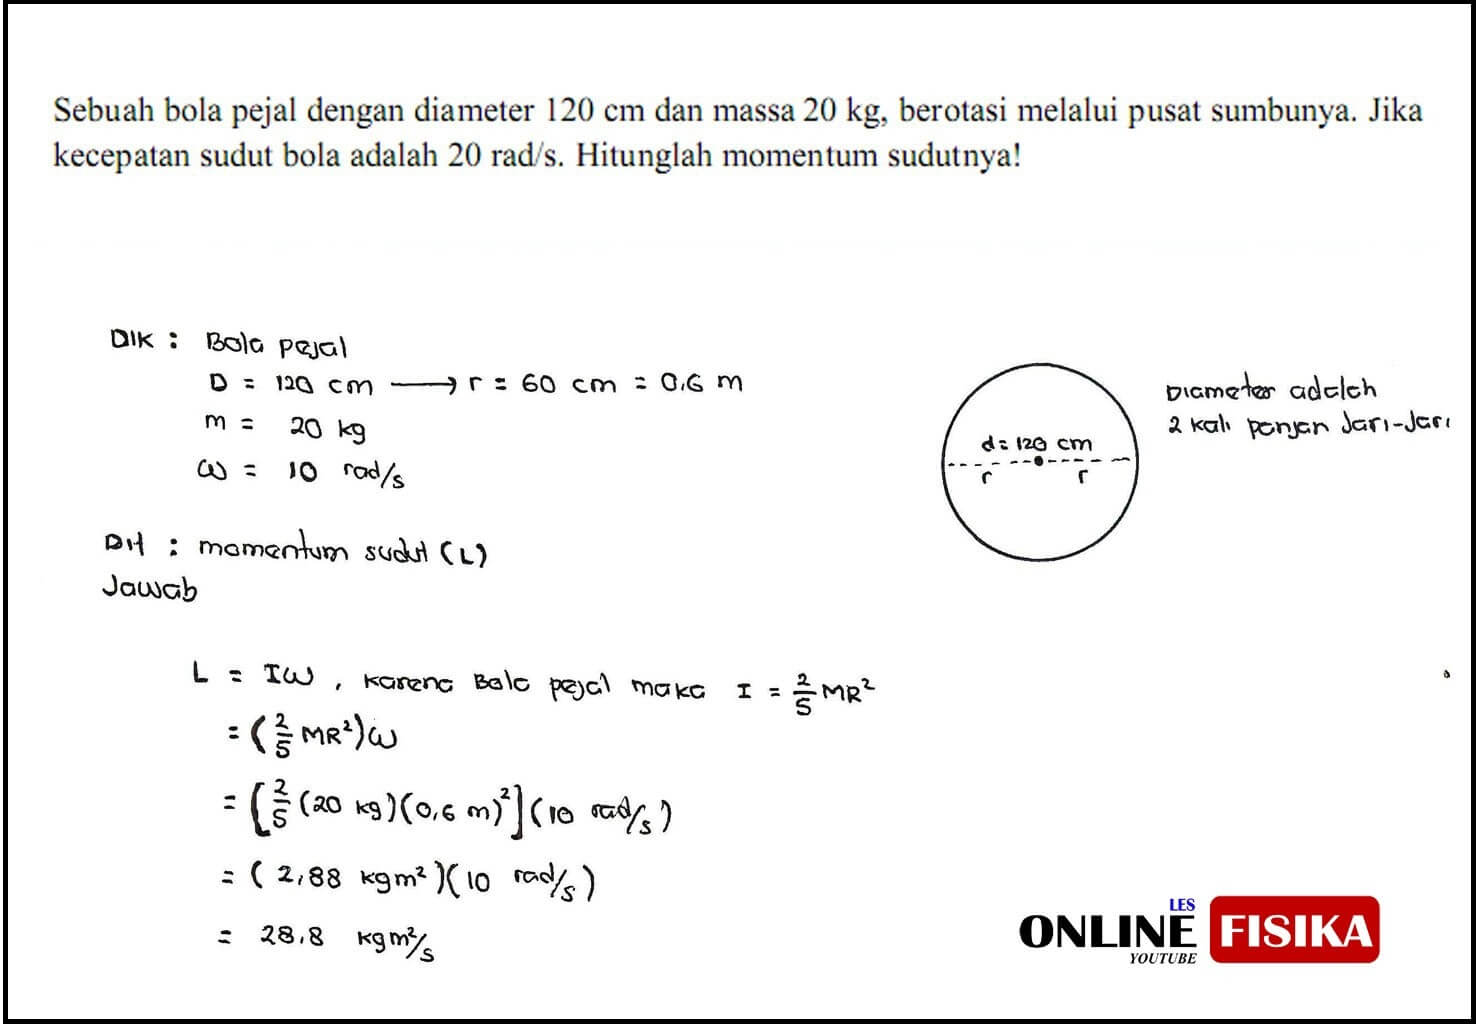 Contoh Soal Momentum Sudut Dinamika Rotasi Les Online Fisika